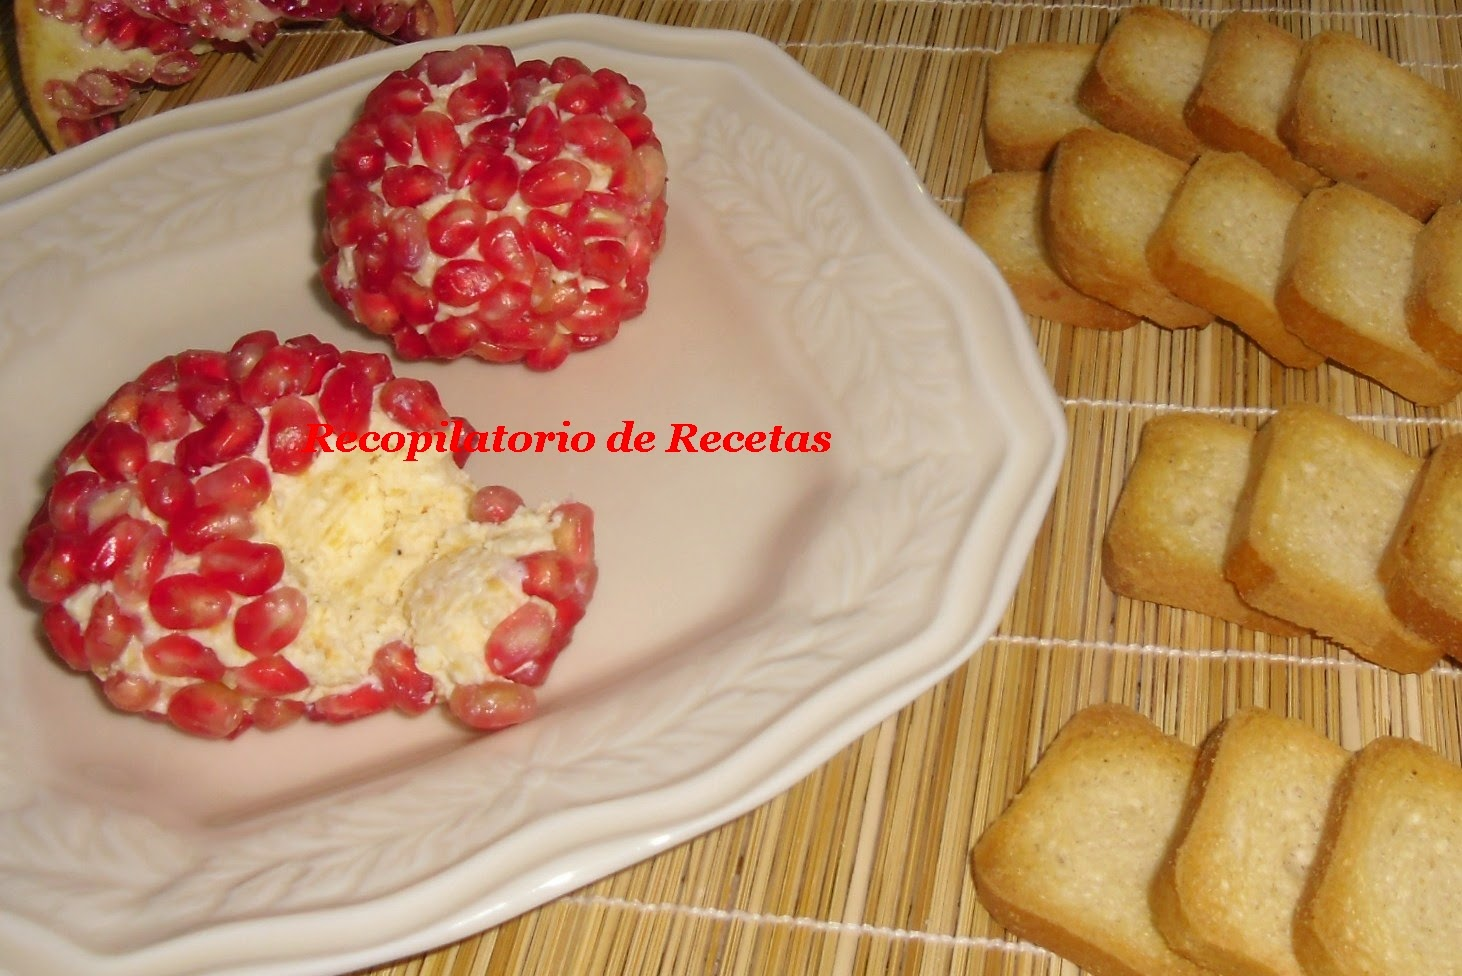 aperitivo quesos con granada en thermomix with comida para un cumpleaos de adulto